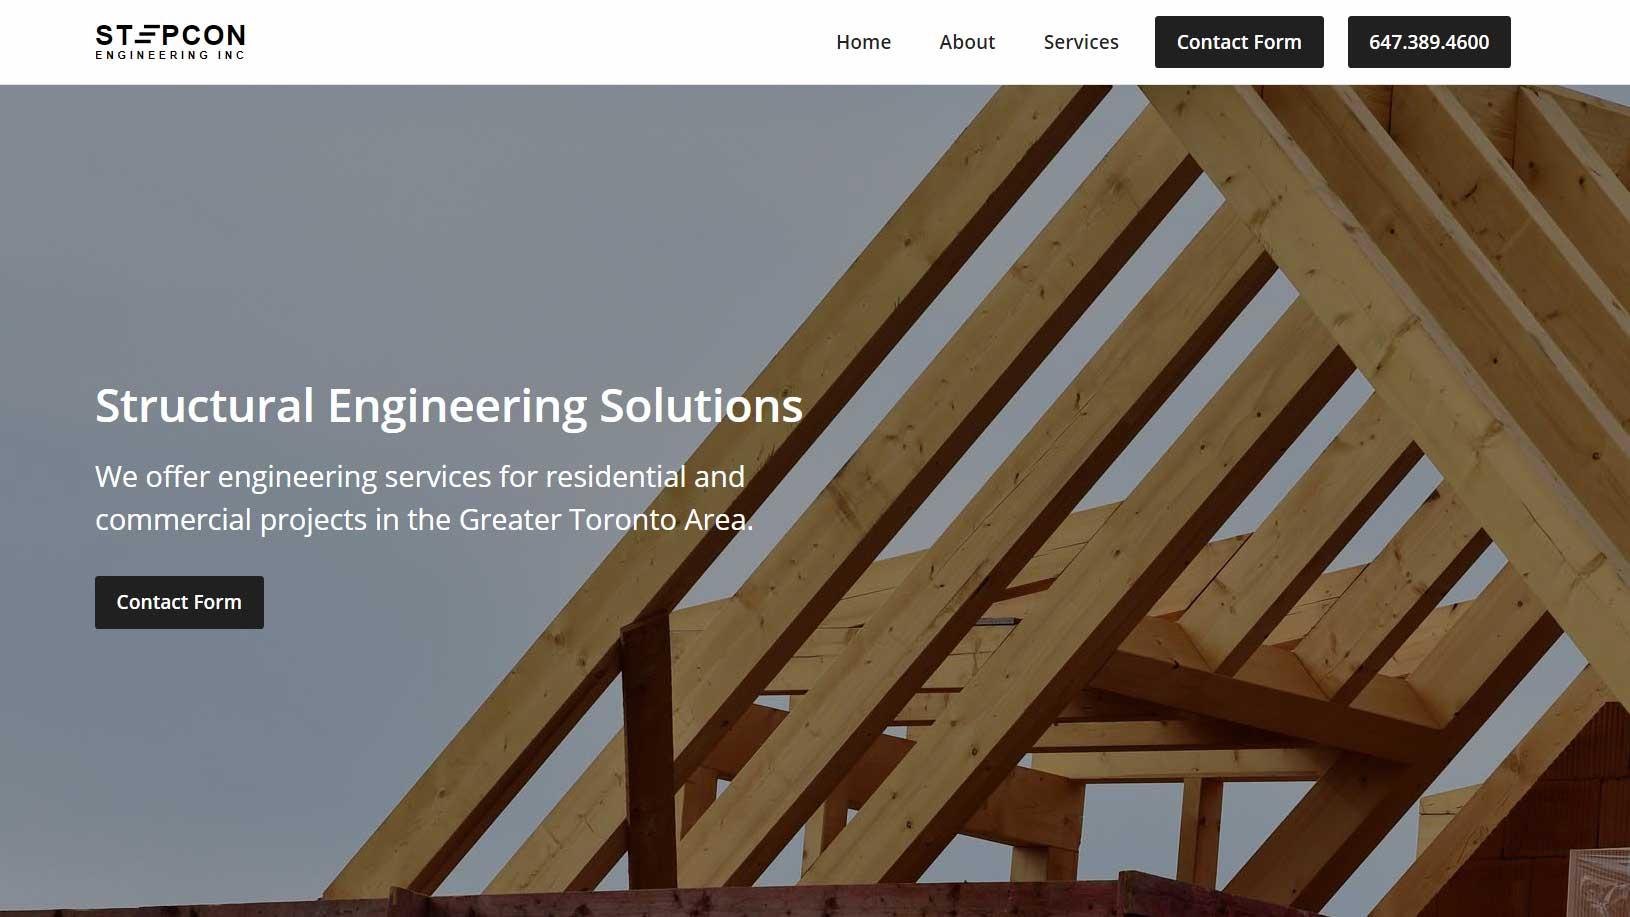 Stepcon Engineering